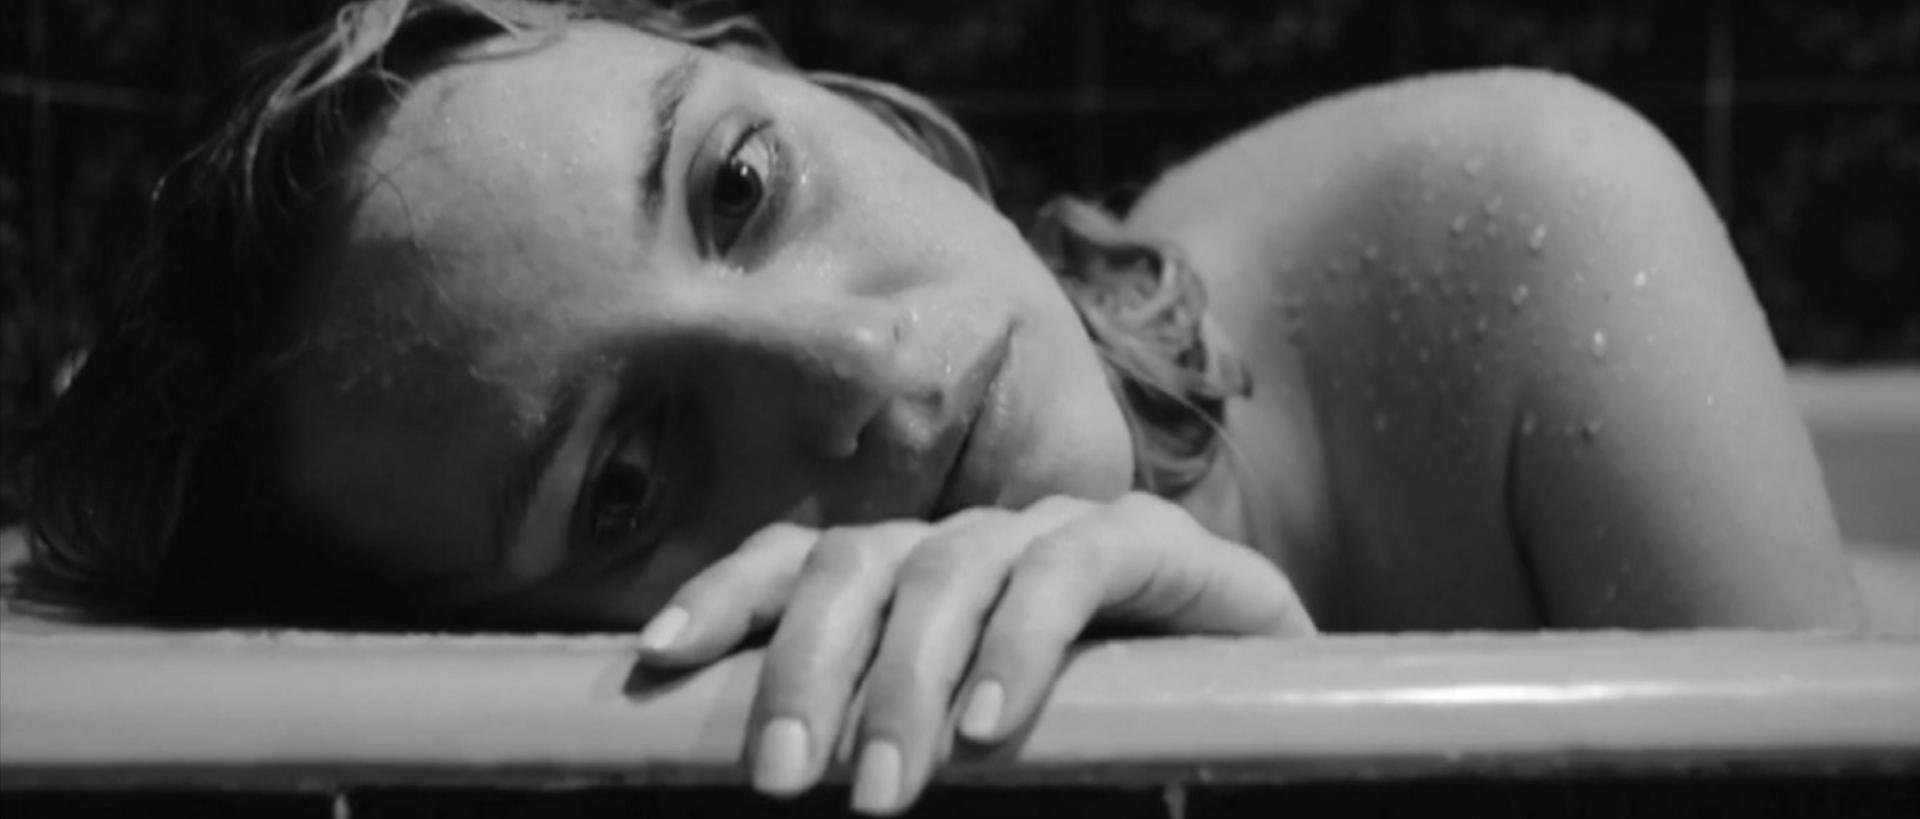 Fancy Alexandersson, actress bathtub